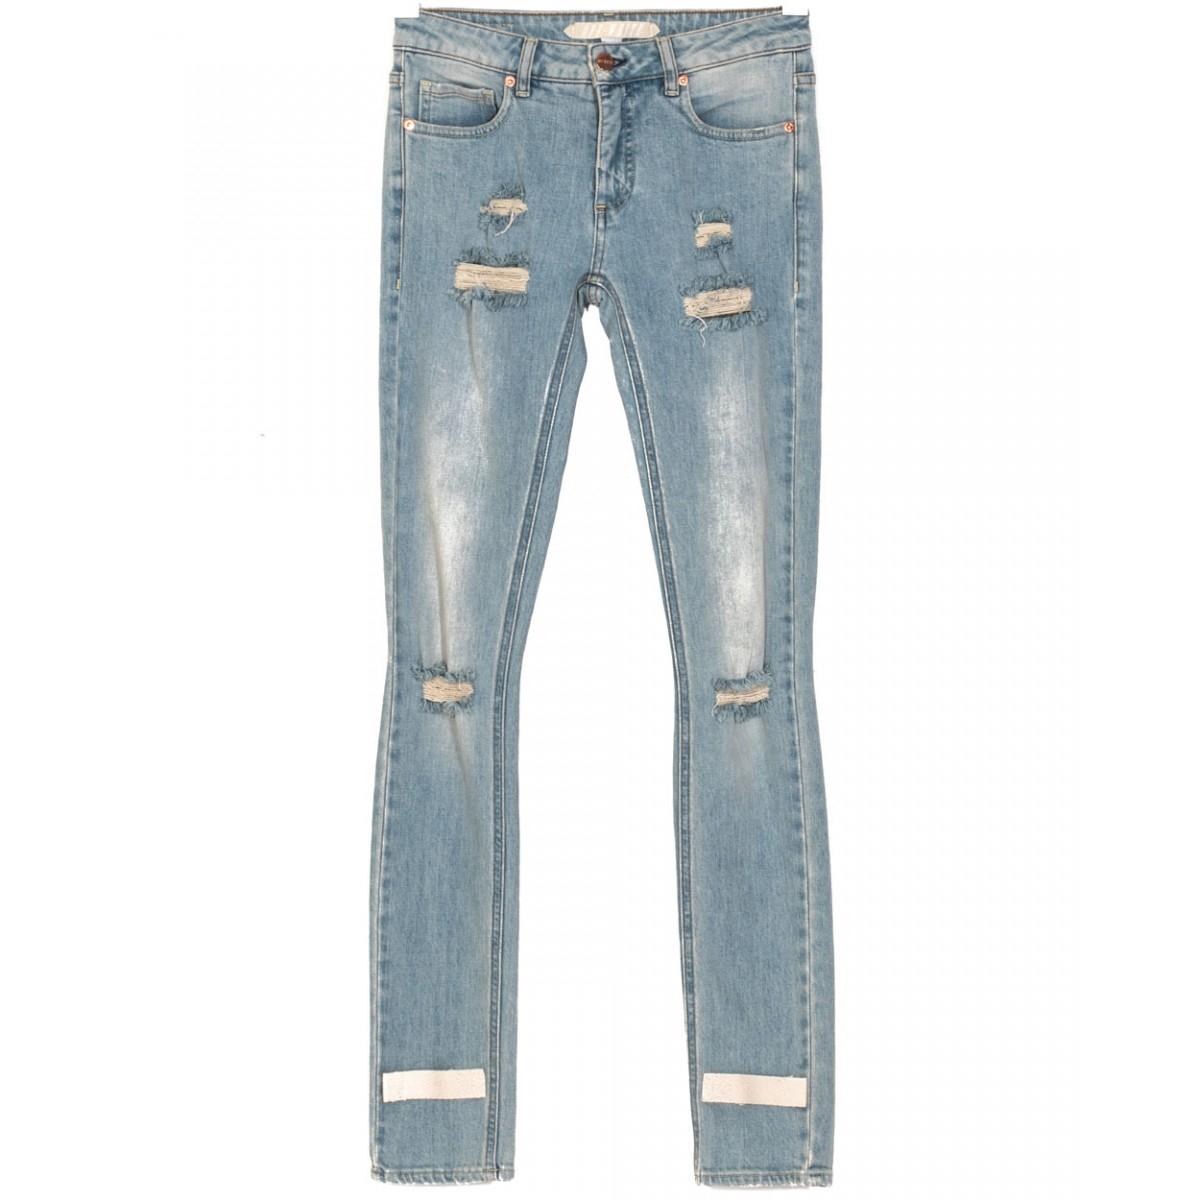 Off White Jeans For Women - Xtellar Jeans